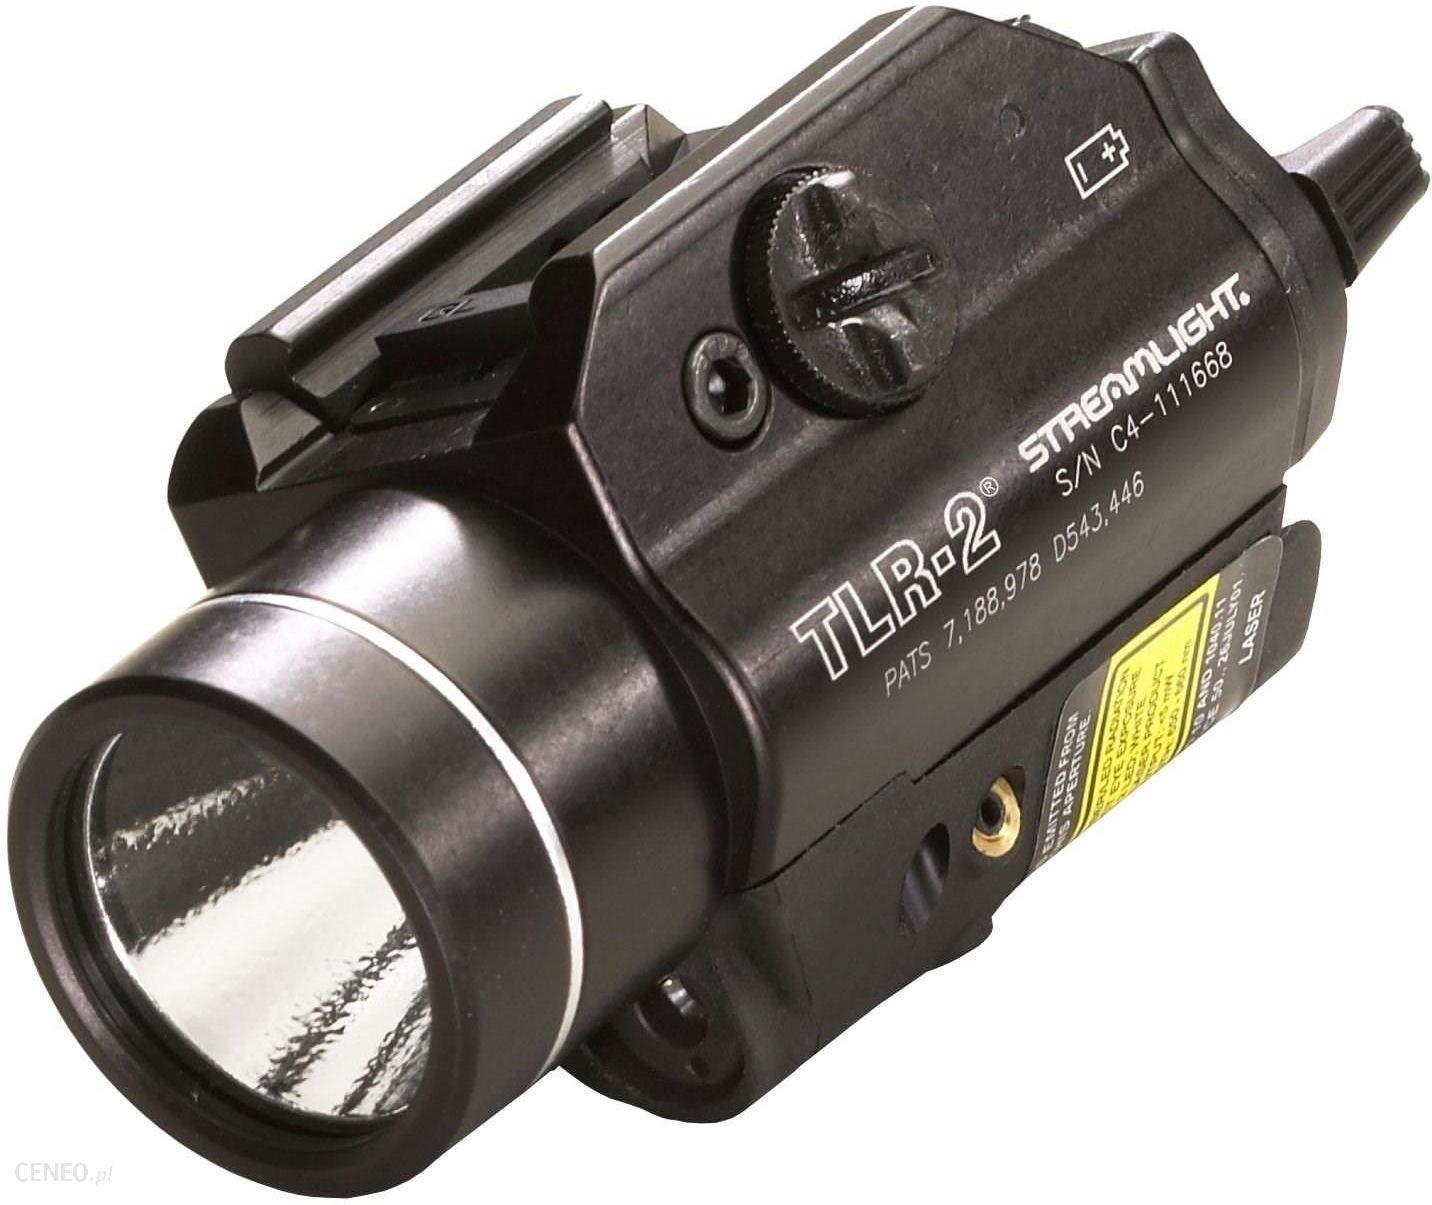 Mactronic Lampa taktyczna TLR-2 69120